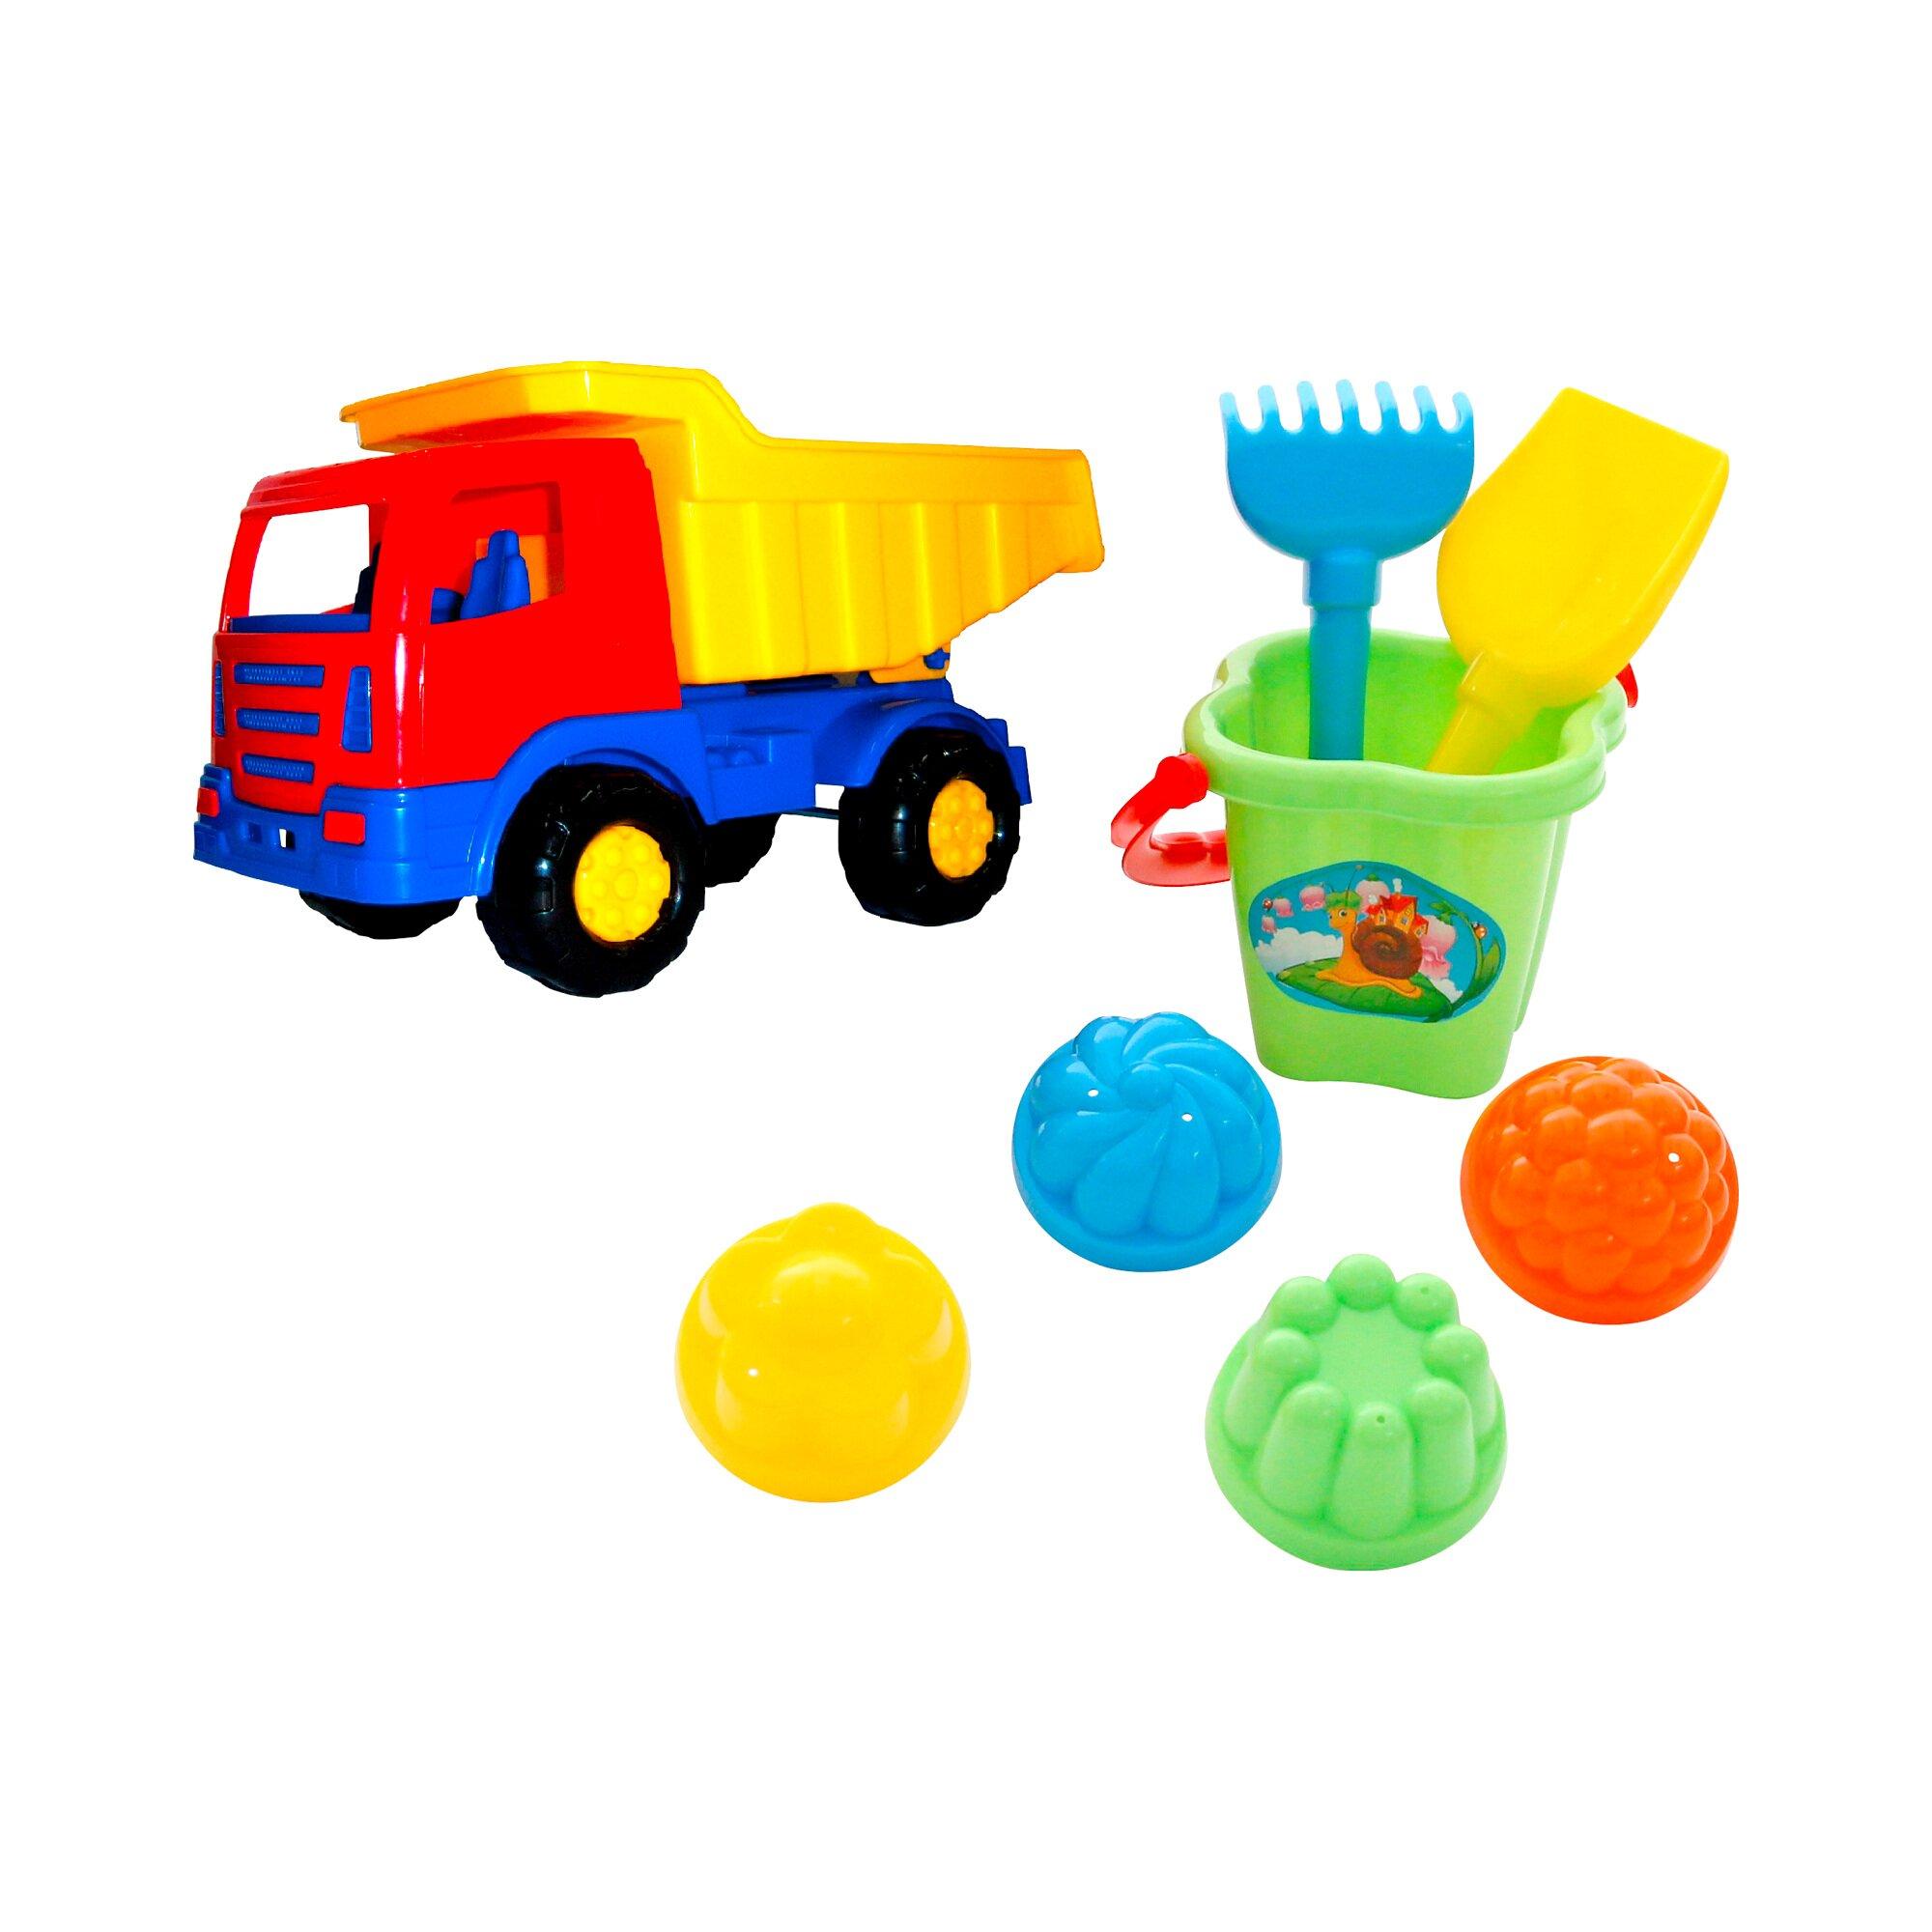 solini-sandspielzeug-mit-kipper-8-teilig, 7.99 EUR @ babywalz-de